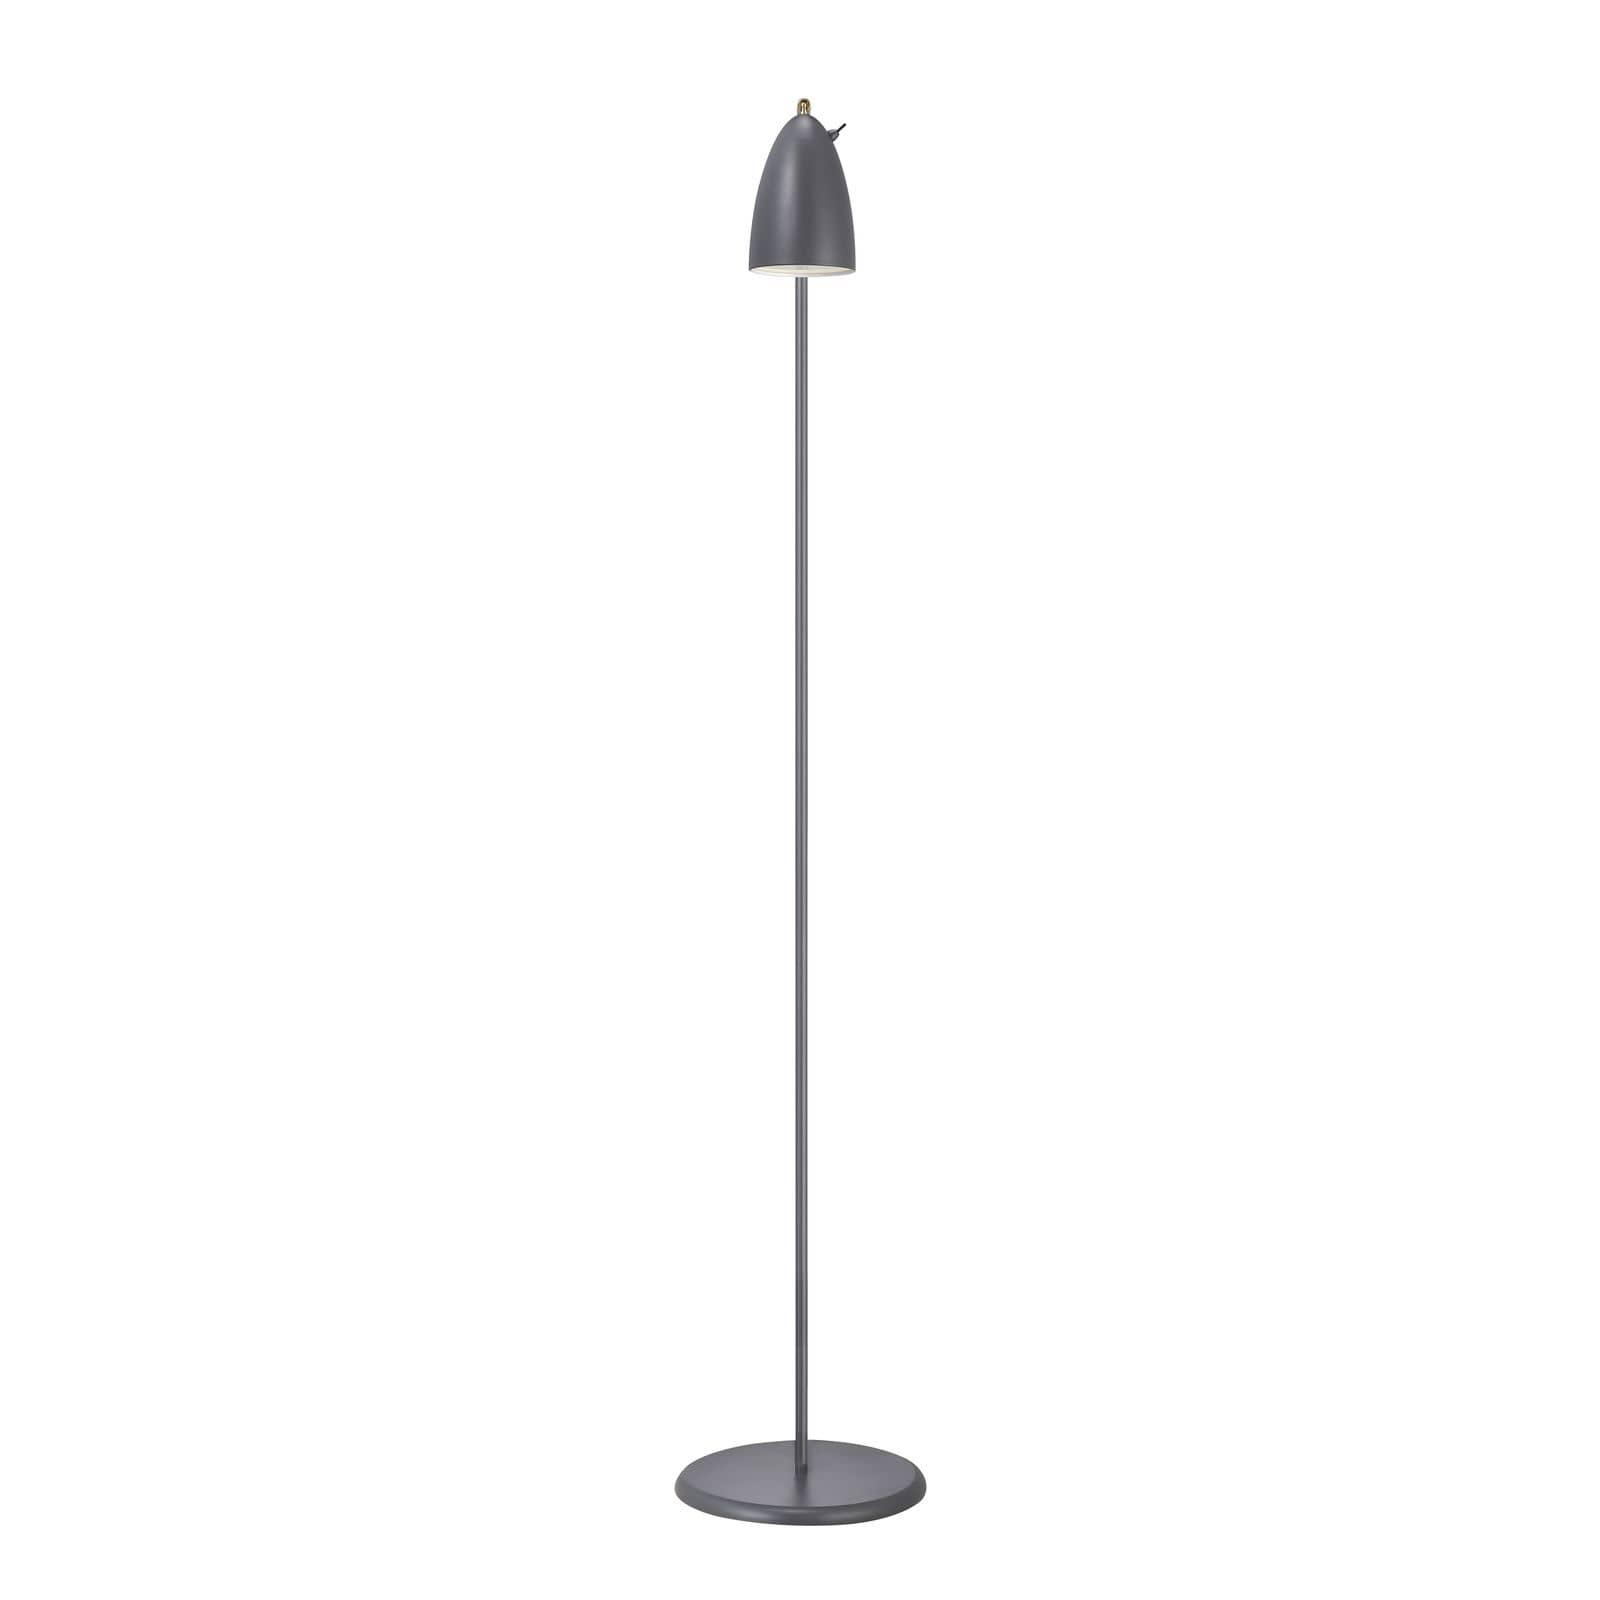 nordlux 77294010 nexus 10 led stehleuchte 3w metall silber. Black Bedroom Furniture Sets. Home Design Ideas